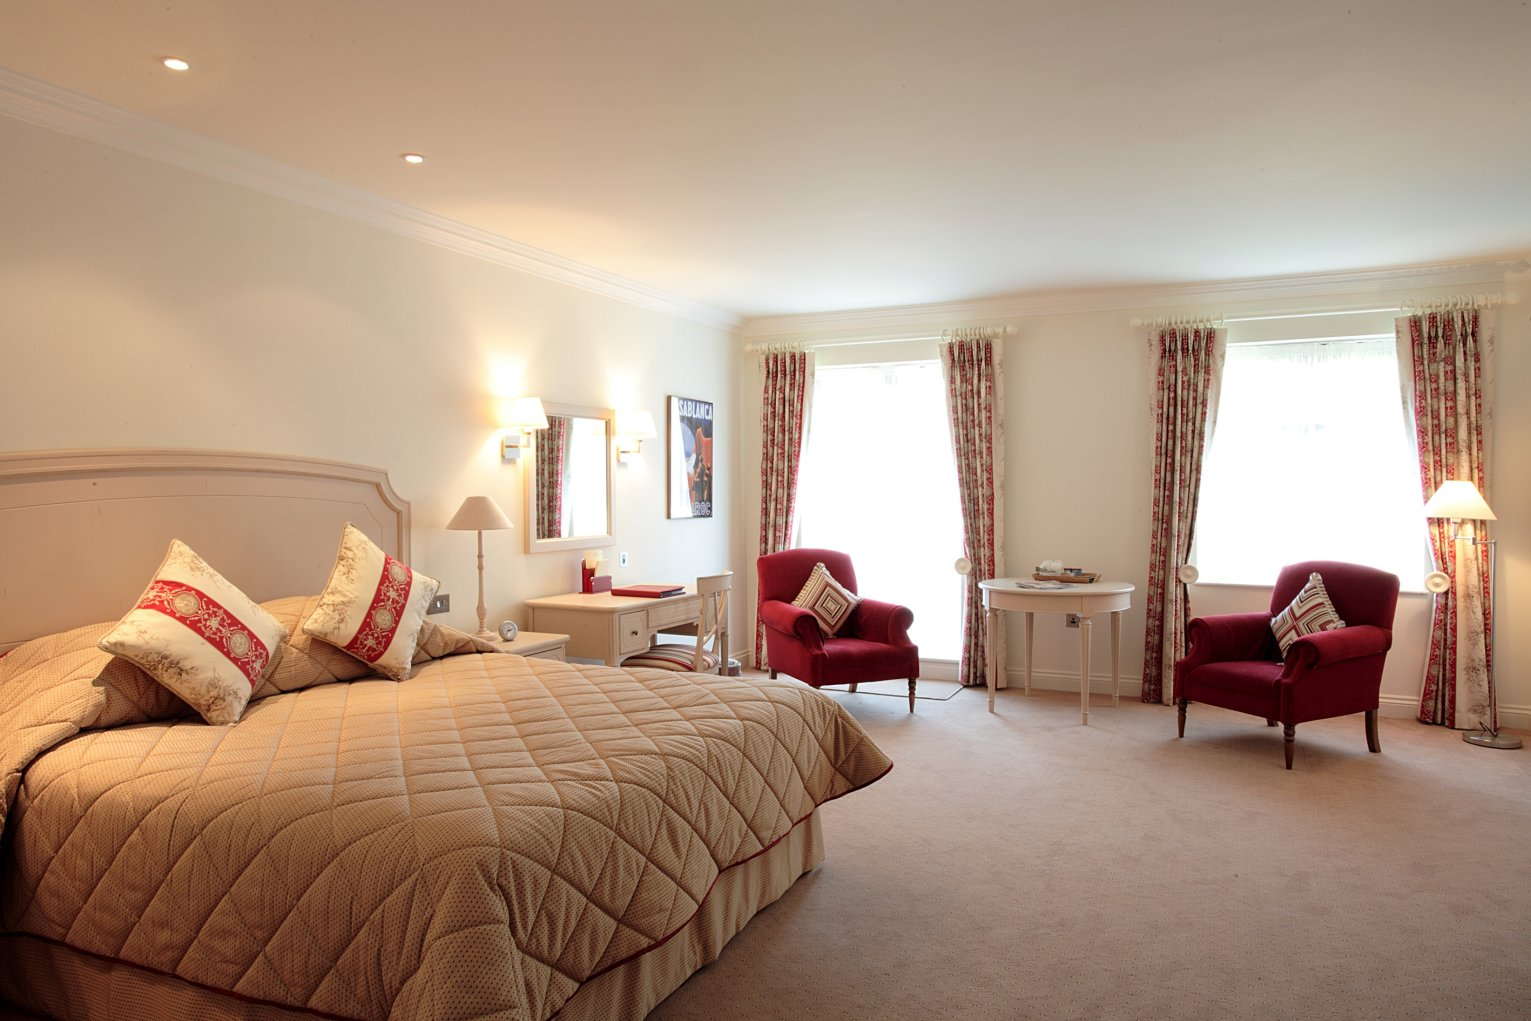 Red and white bedroom interior designing ideas - Interior design and decoration ...